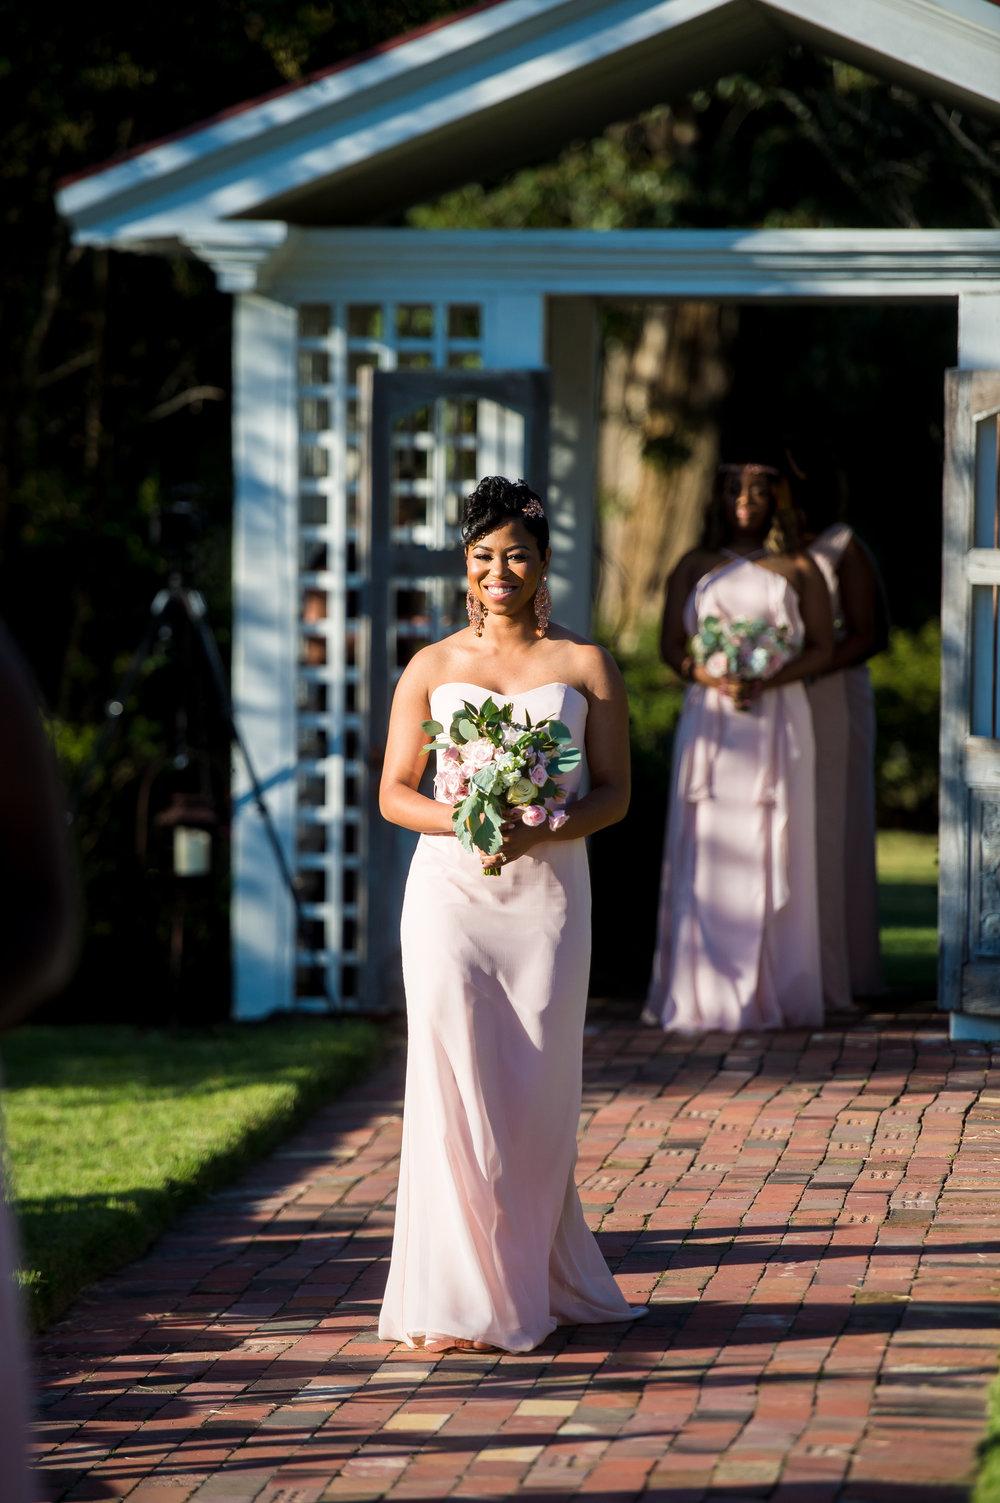 Mr Theodore_Same-Sex weddings Australia_real-wedding40.jpg